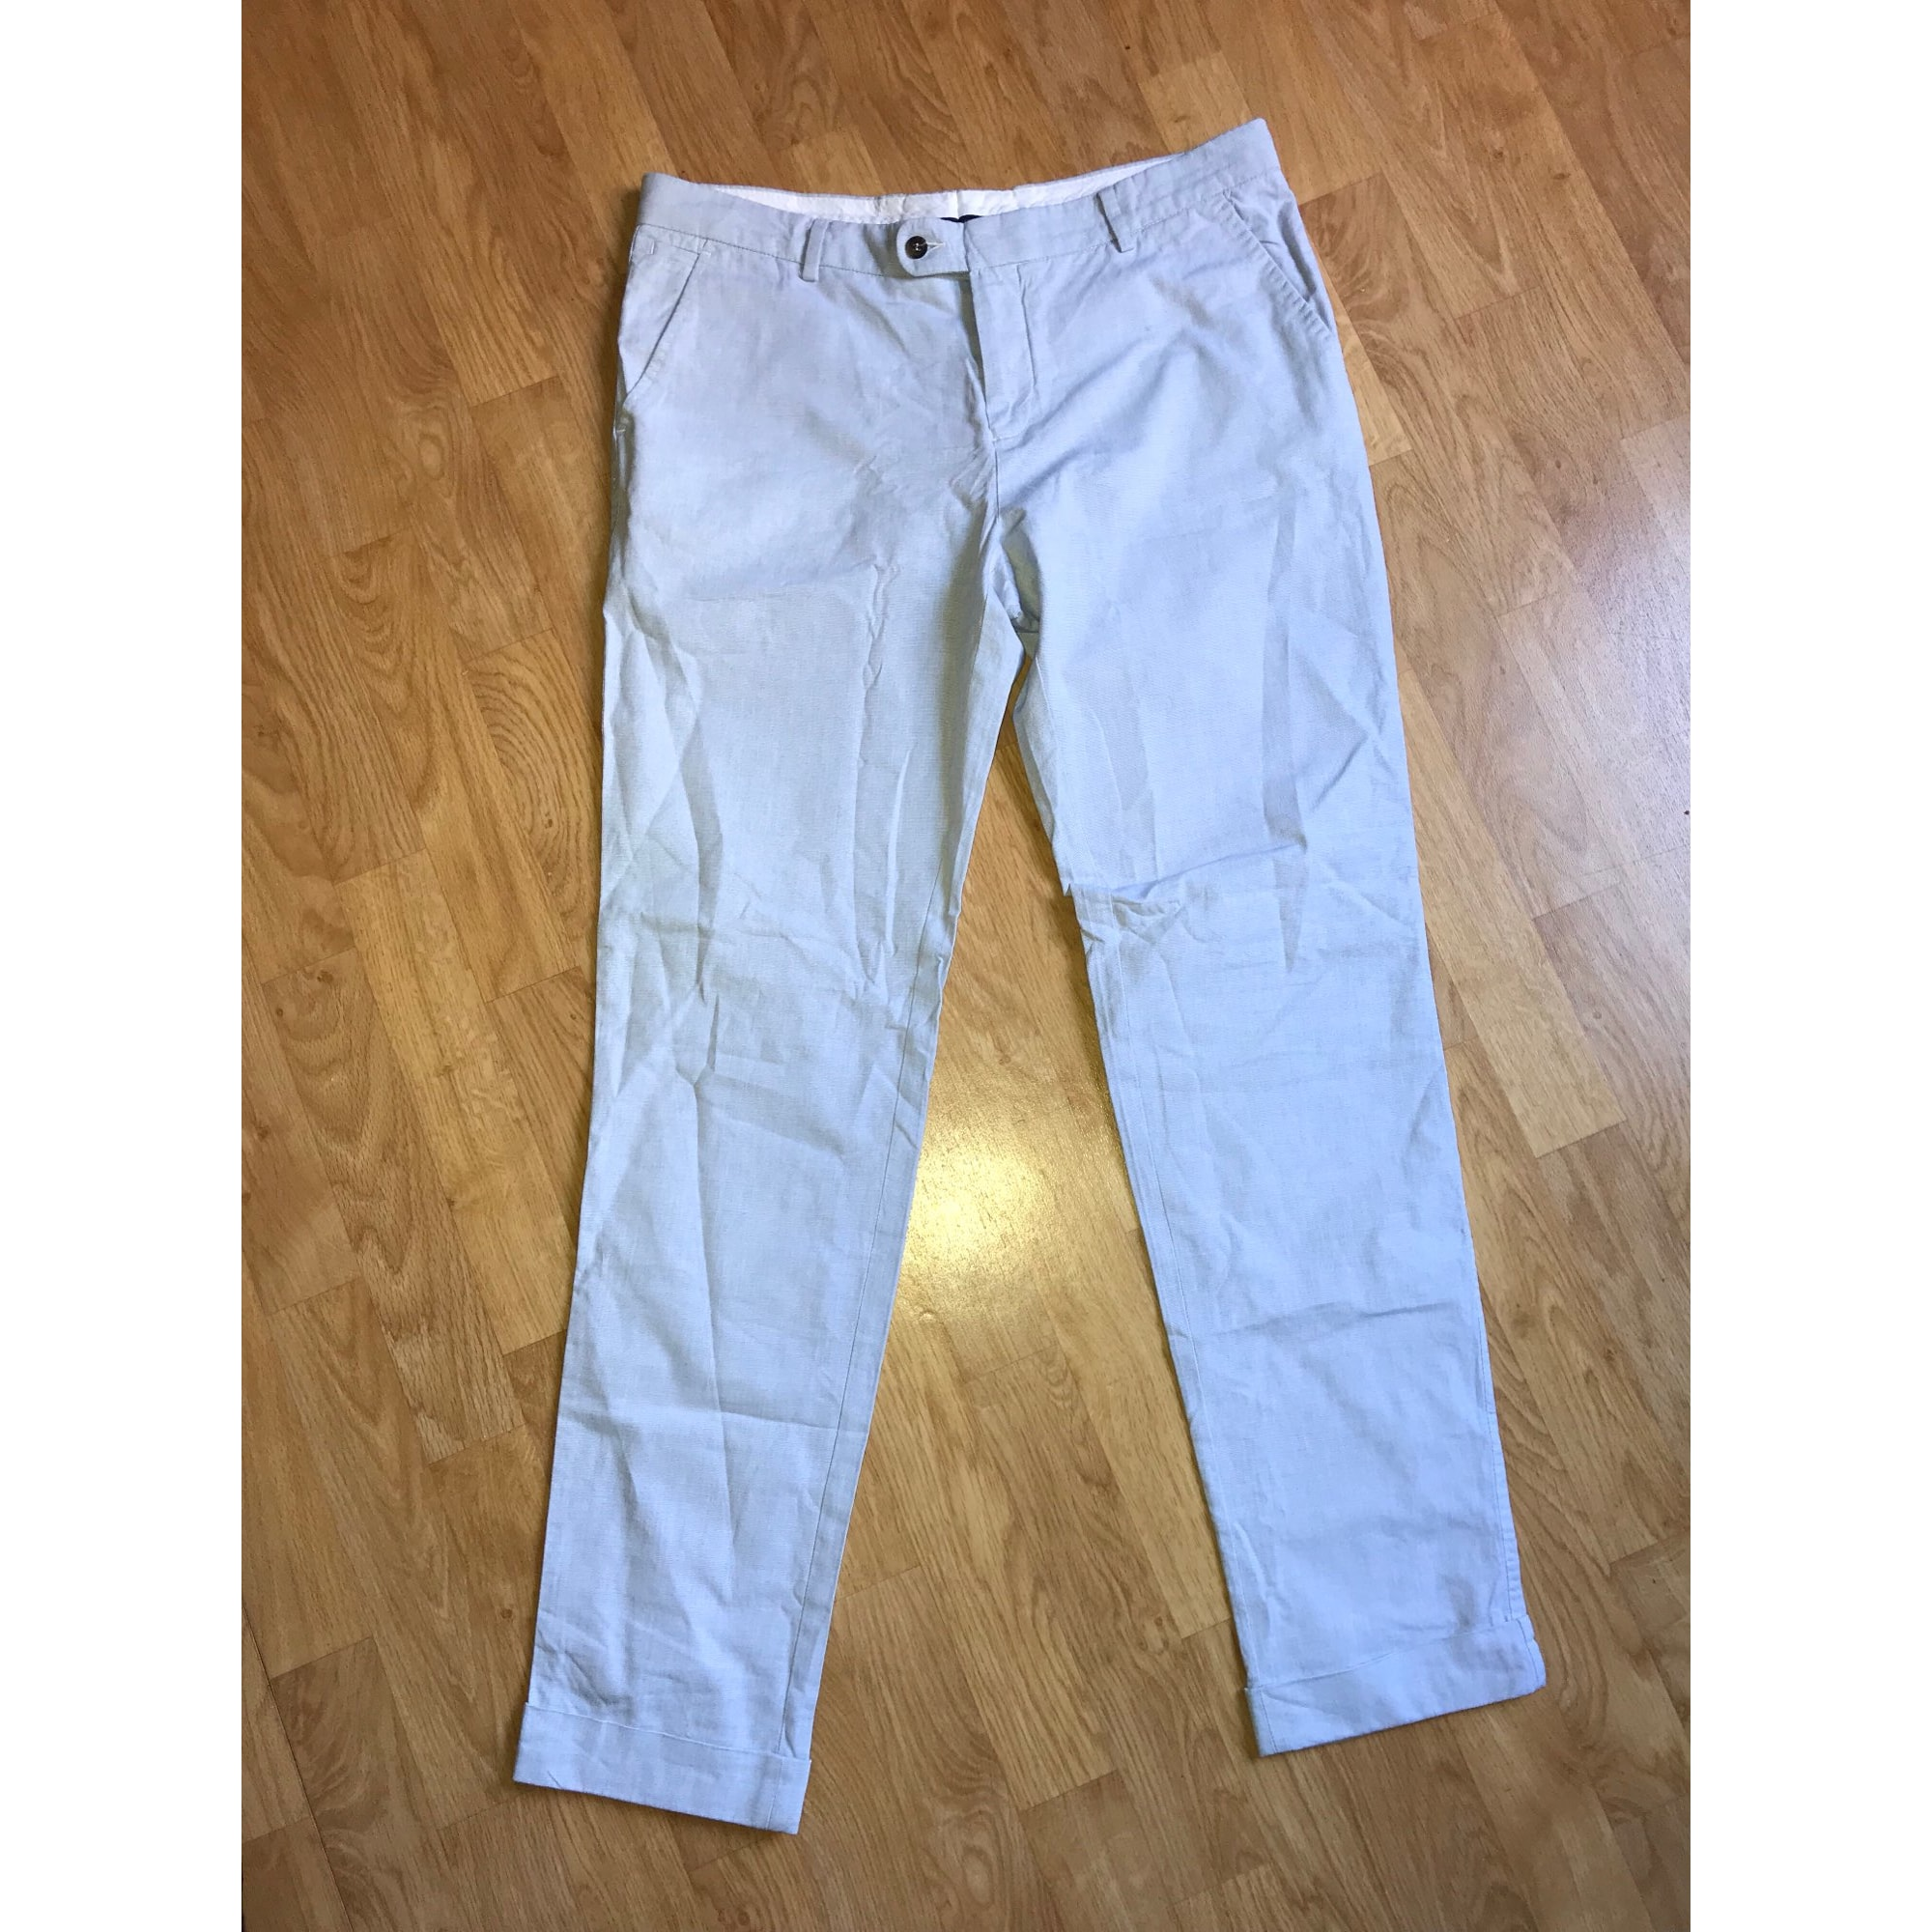 Pantalon droit MC GREGOR Bleu, bleu marine, bleu turquoise